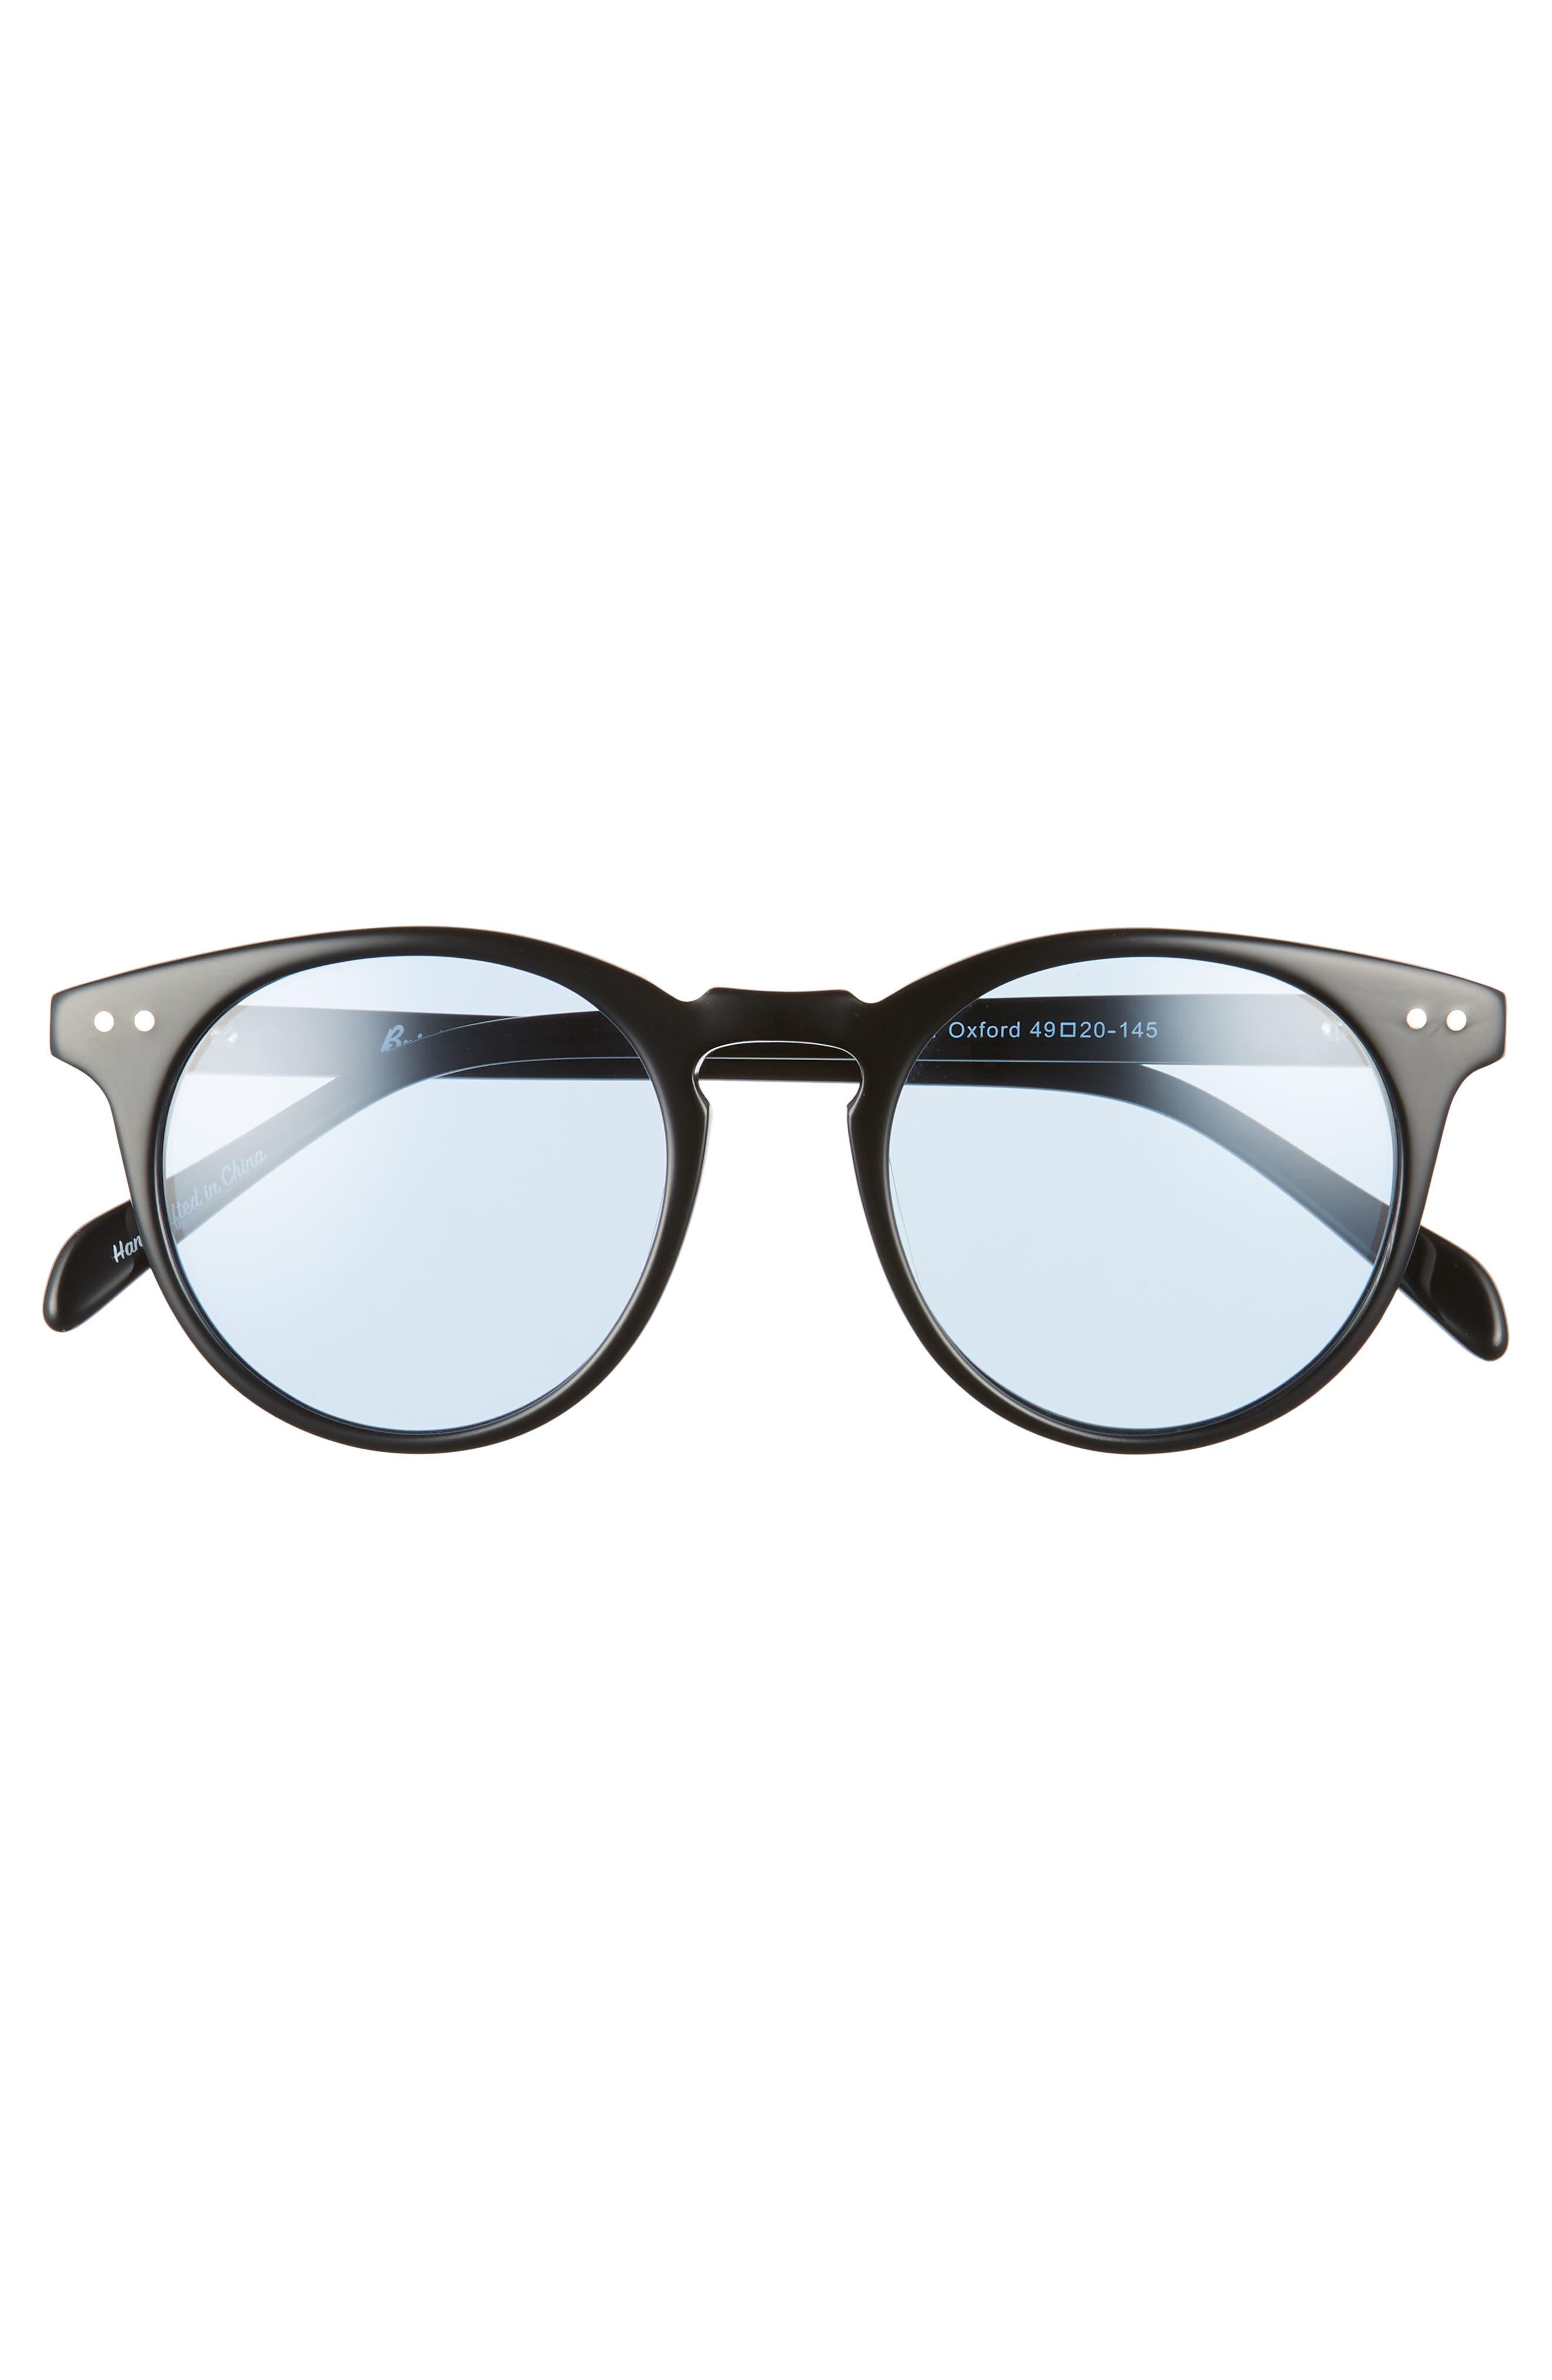 Oxford 49mm Sunglasses,                             Alternate thumbnail 3, color,                             BLACK/ ARCTIC BLUE